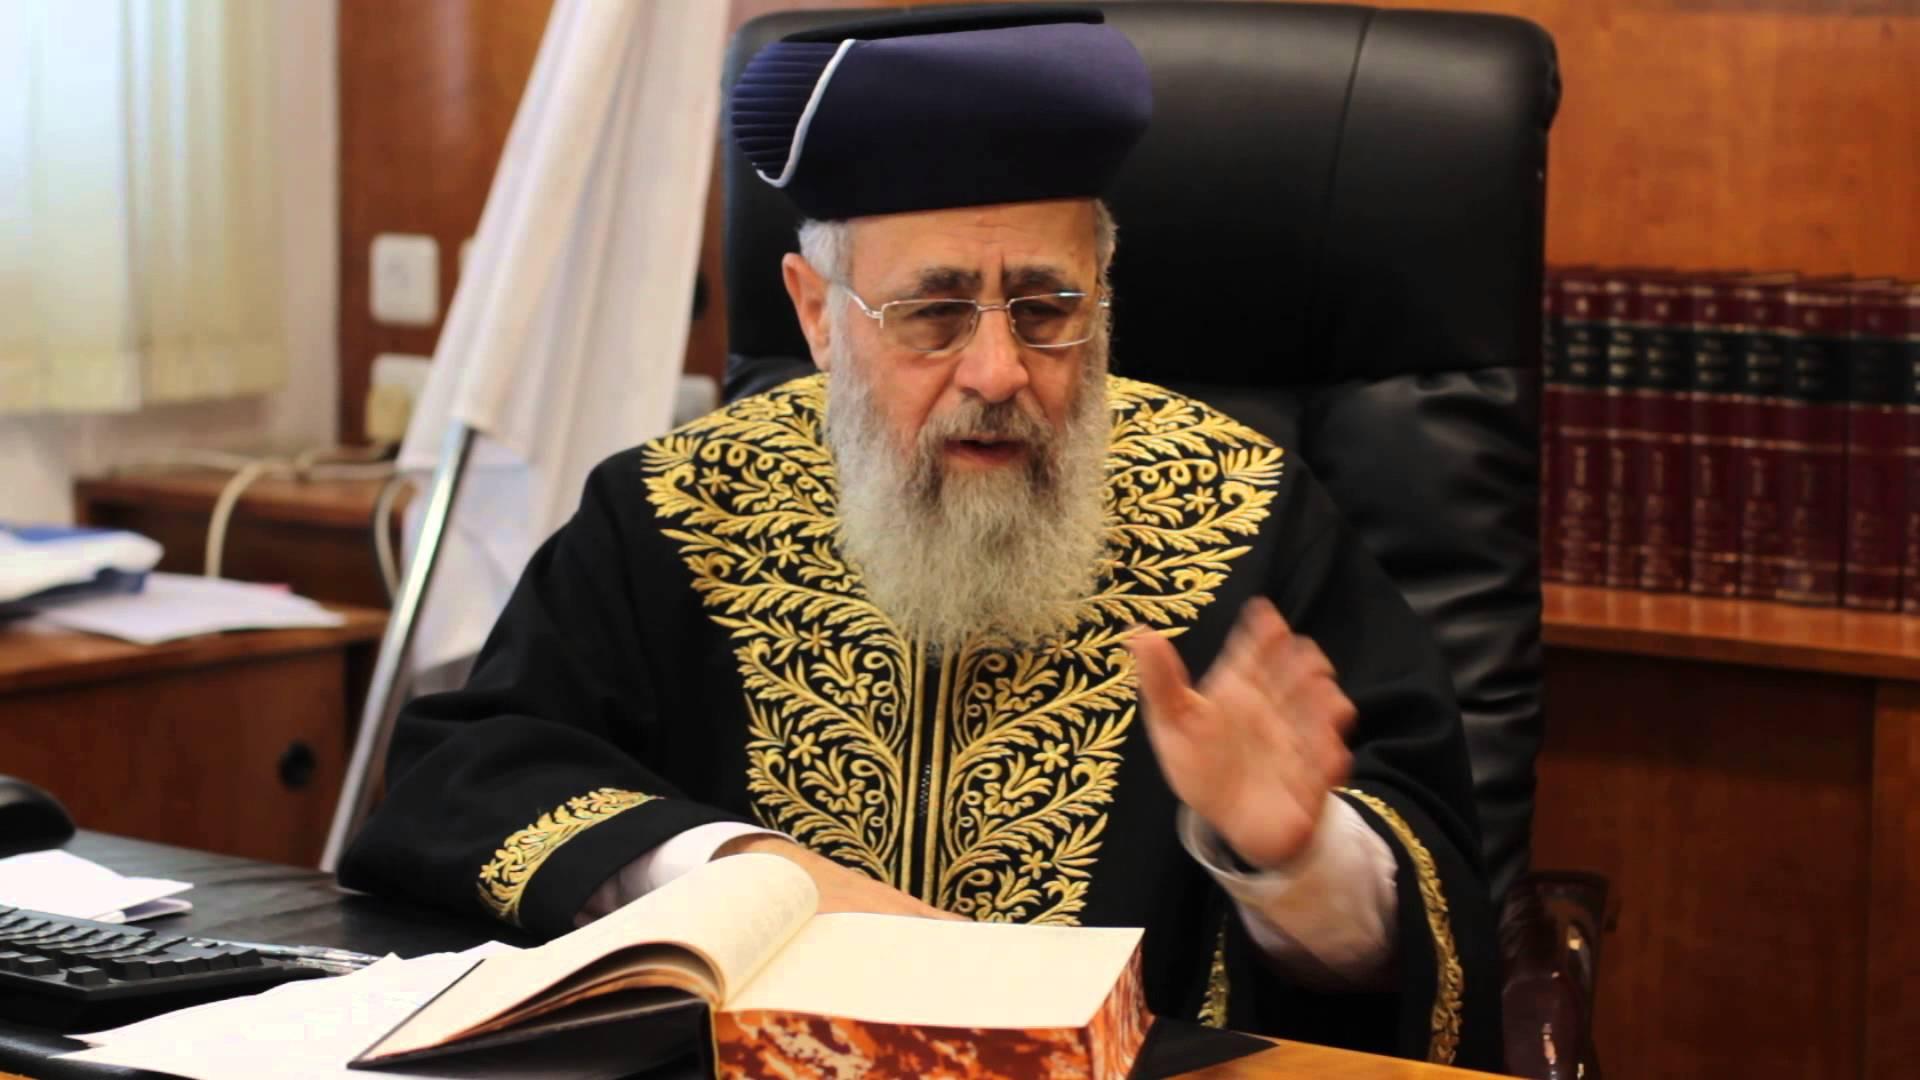 Rishon L'Tzion On Rabbonim Who Partake In Chasunah Merriment